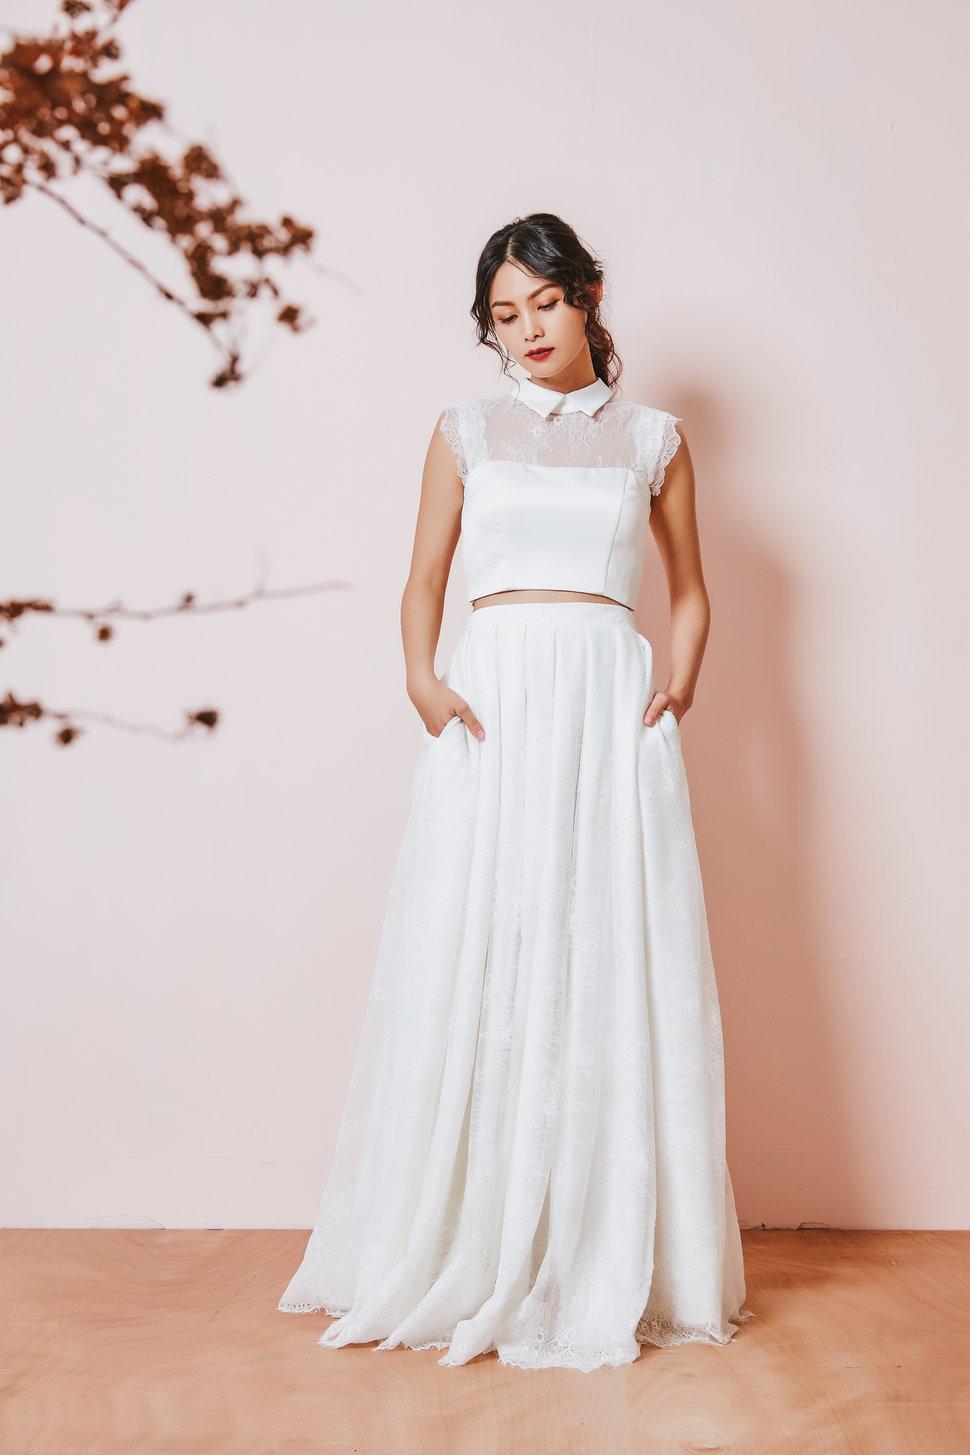 2019032718740 - Mikeshi wedding 米娔詩手《結婚吧》